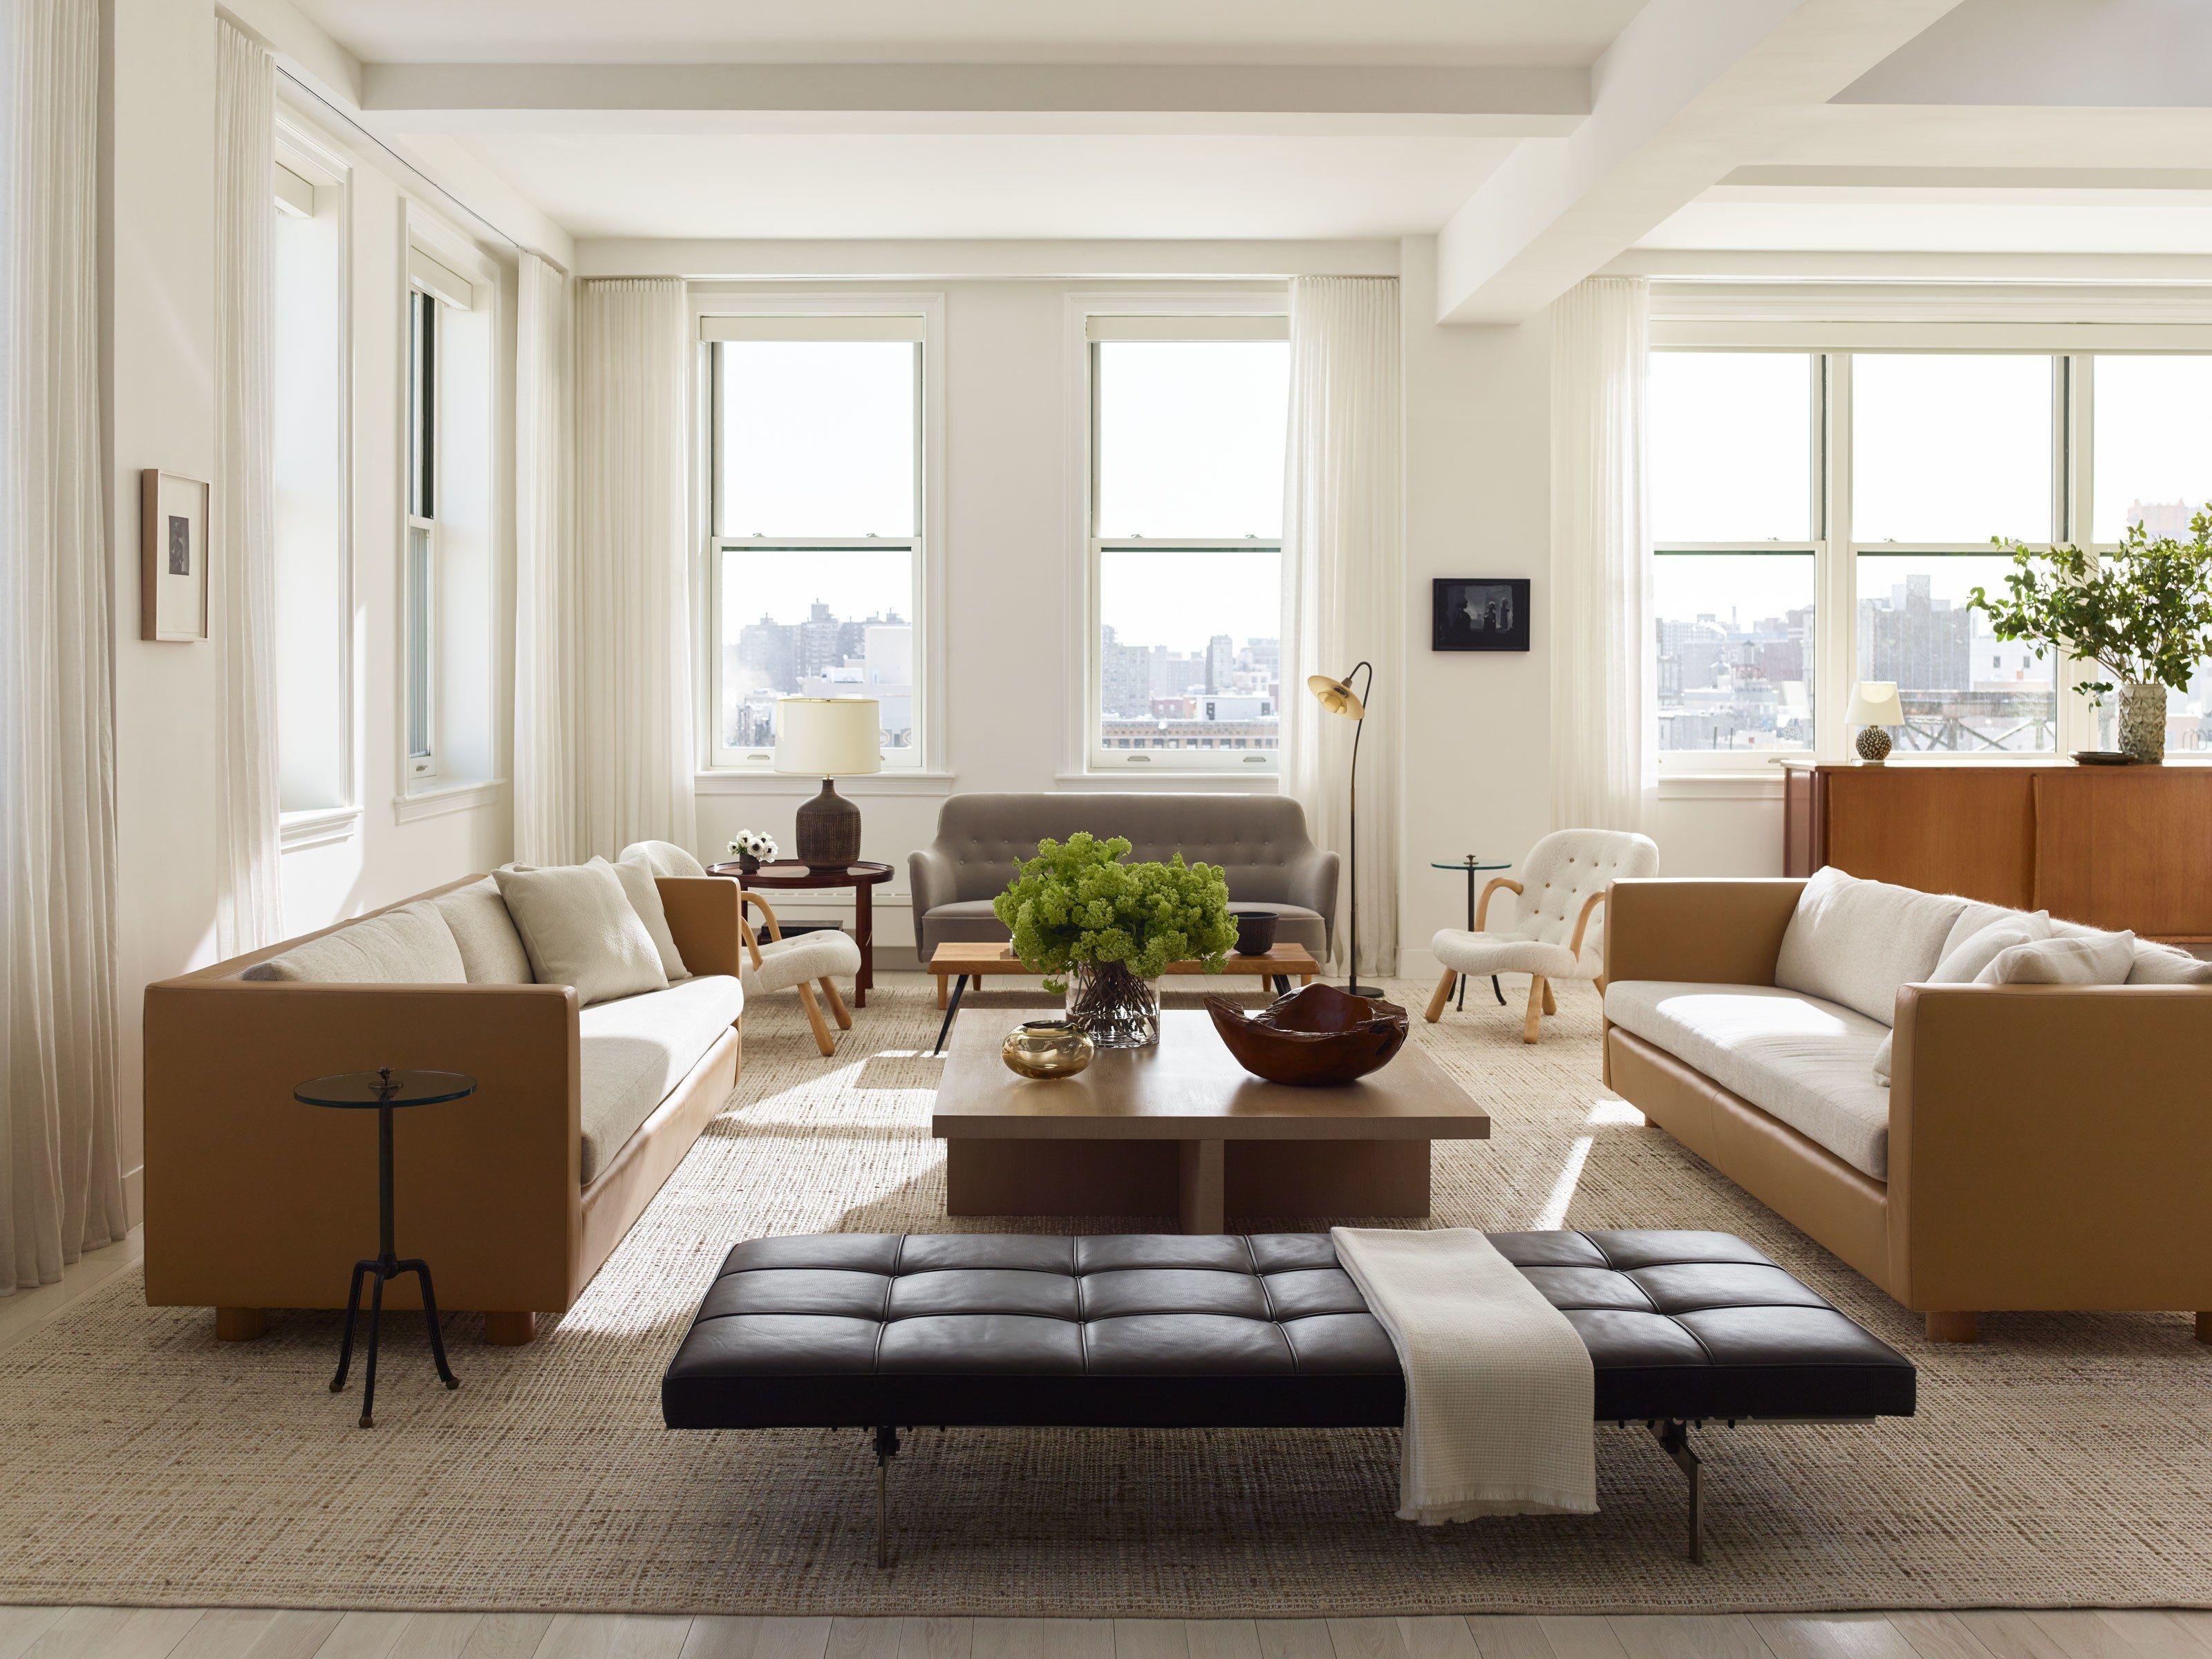 This Serene Manhattan Loft Has Unreal City Views | Manhattan, Lofts ...